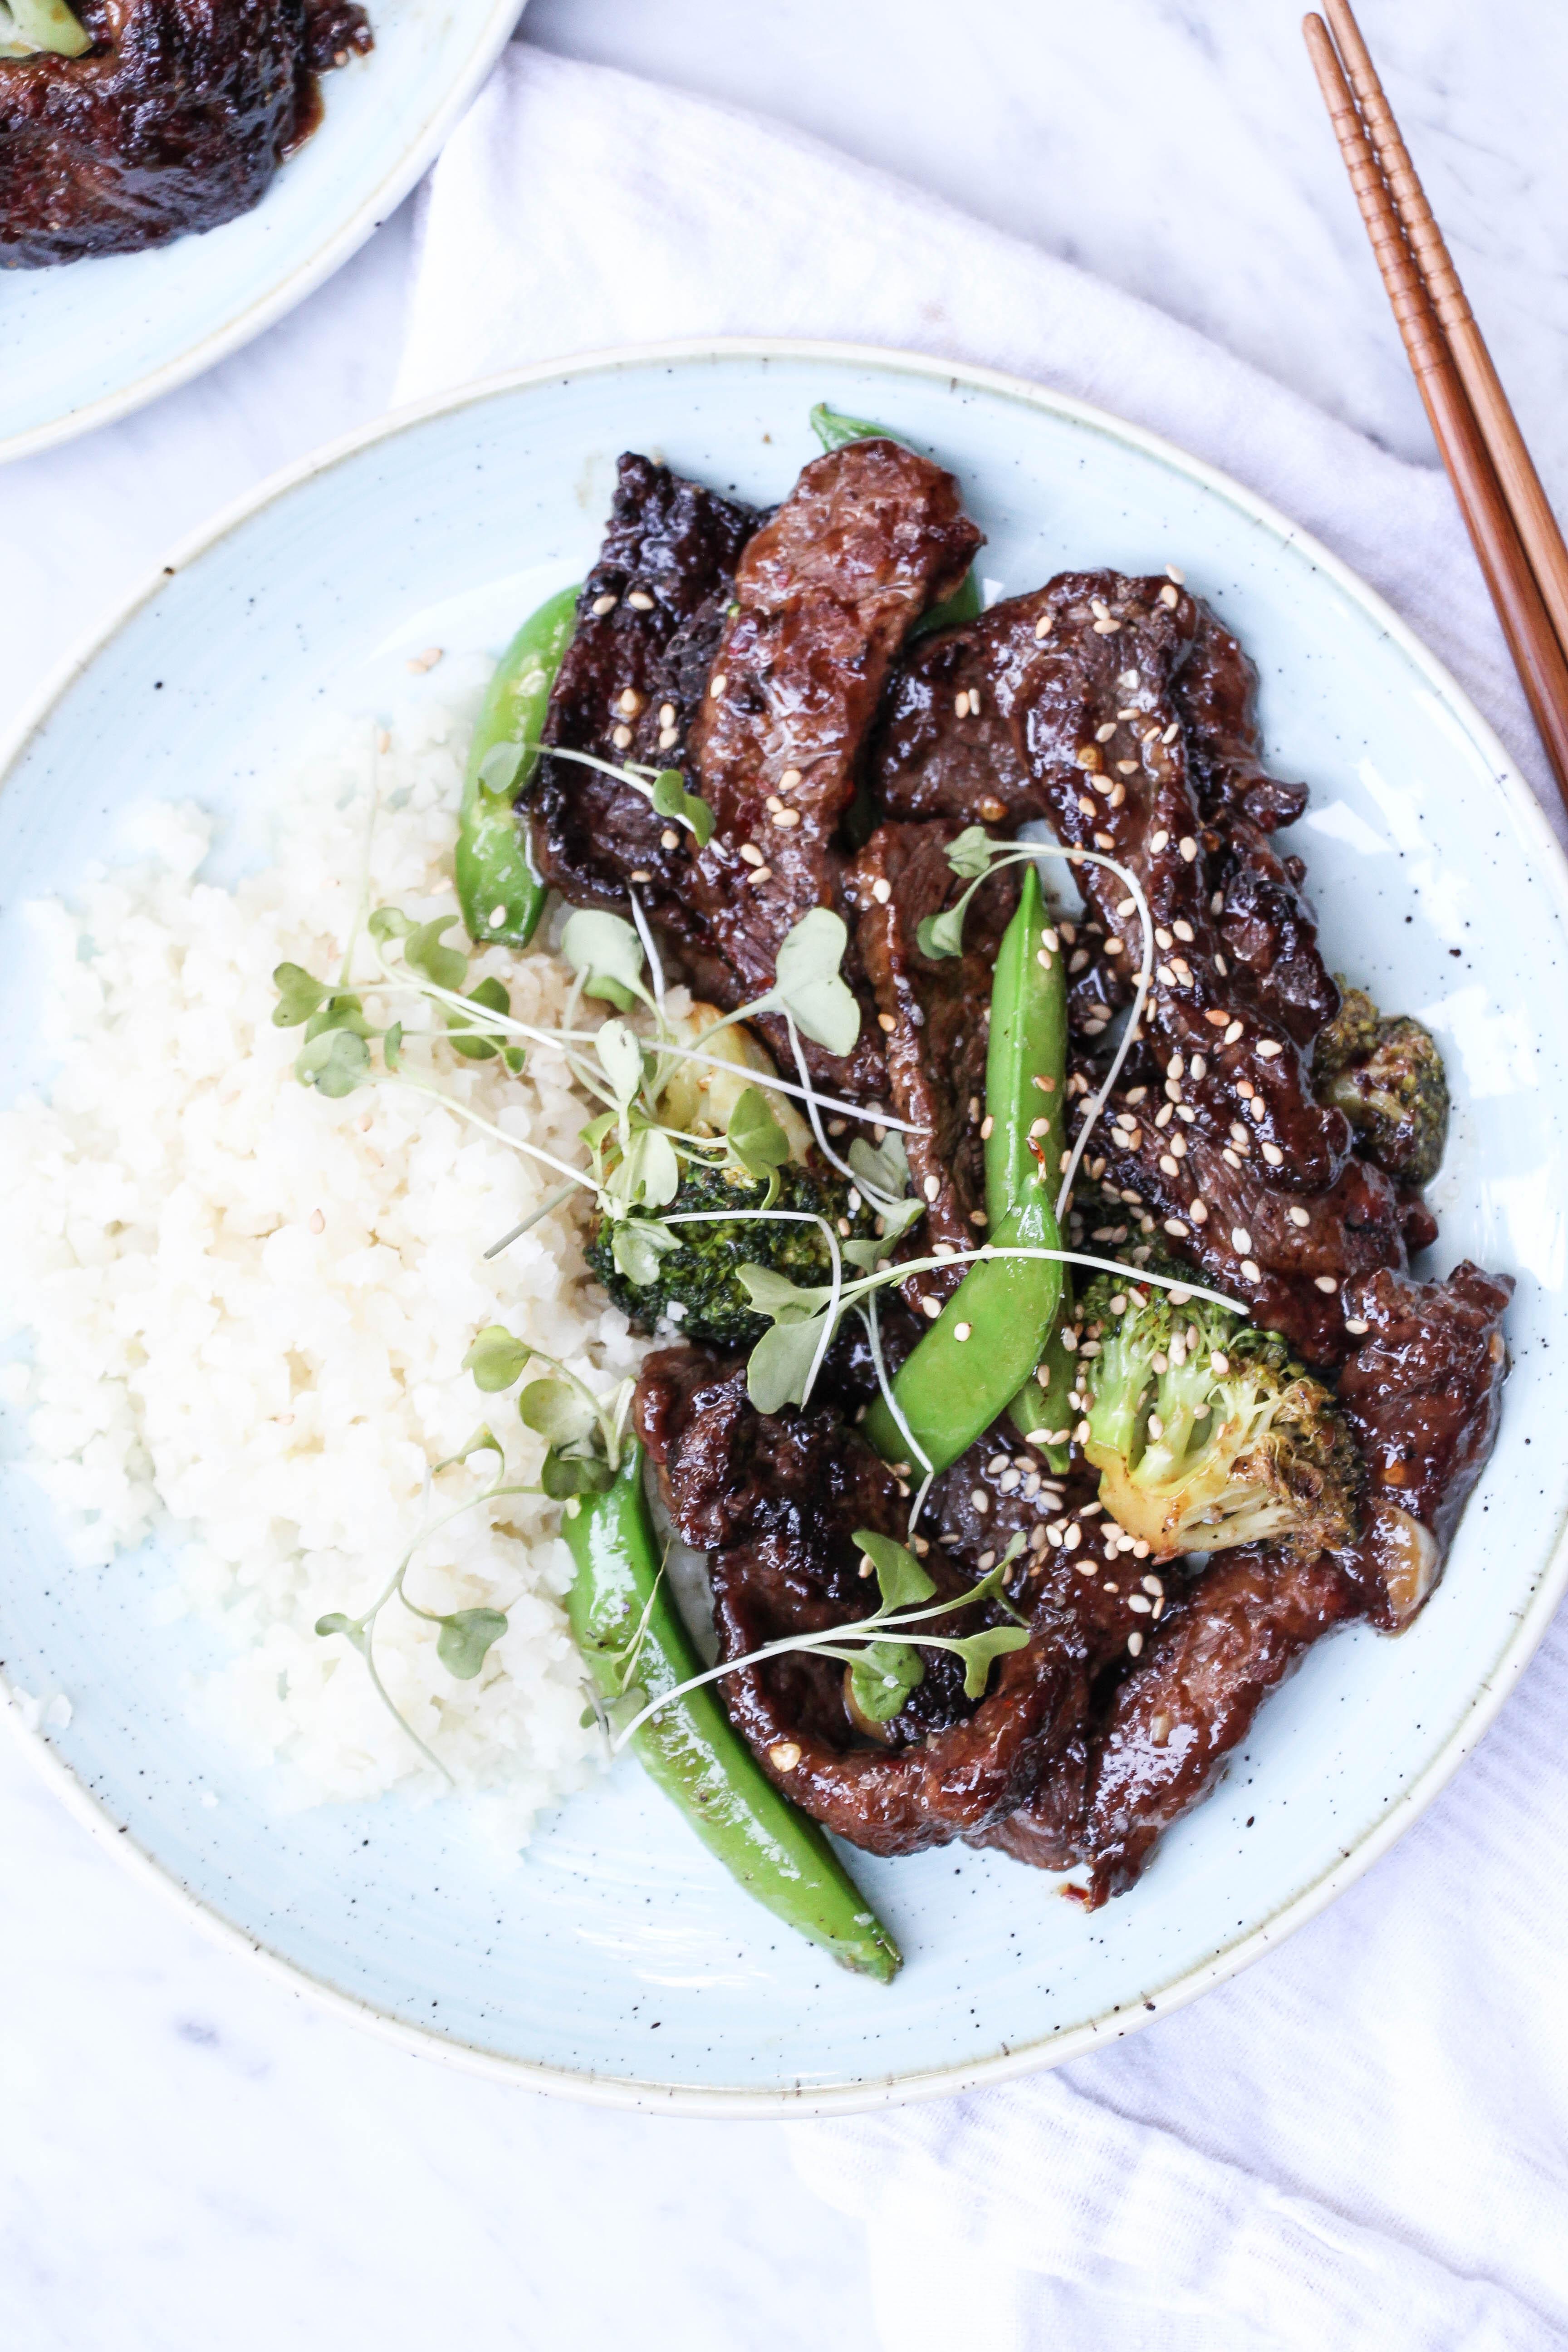 Crispy Ginger Beef + Broccoli Stir Fry